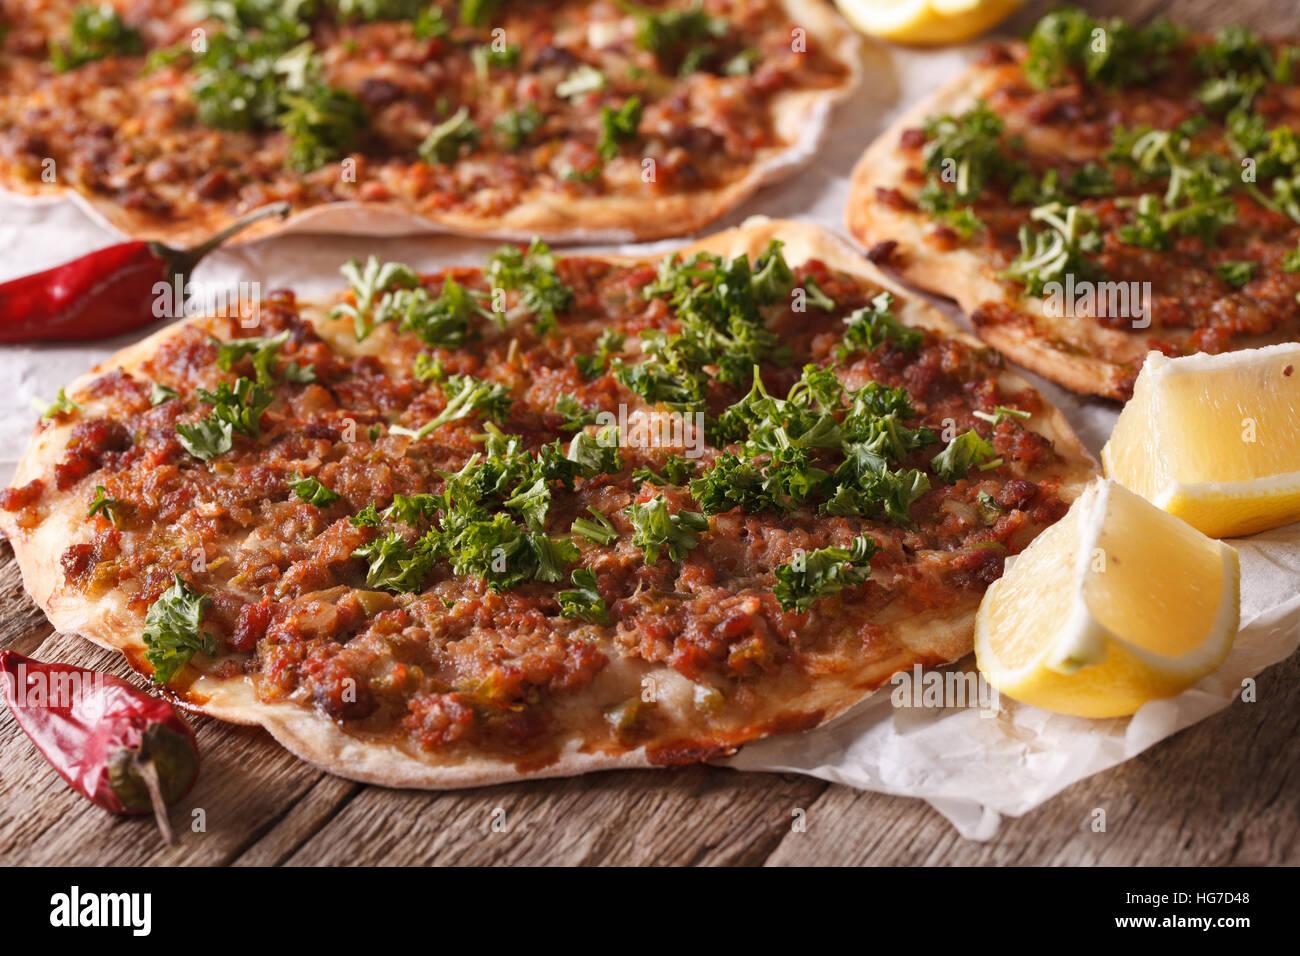 Turkish Food: lahmacun closeup on a wooden table. Horizontal - Stock Image